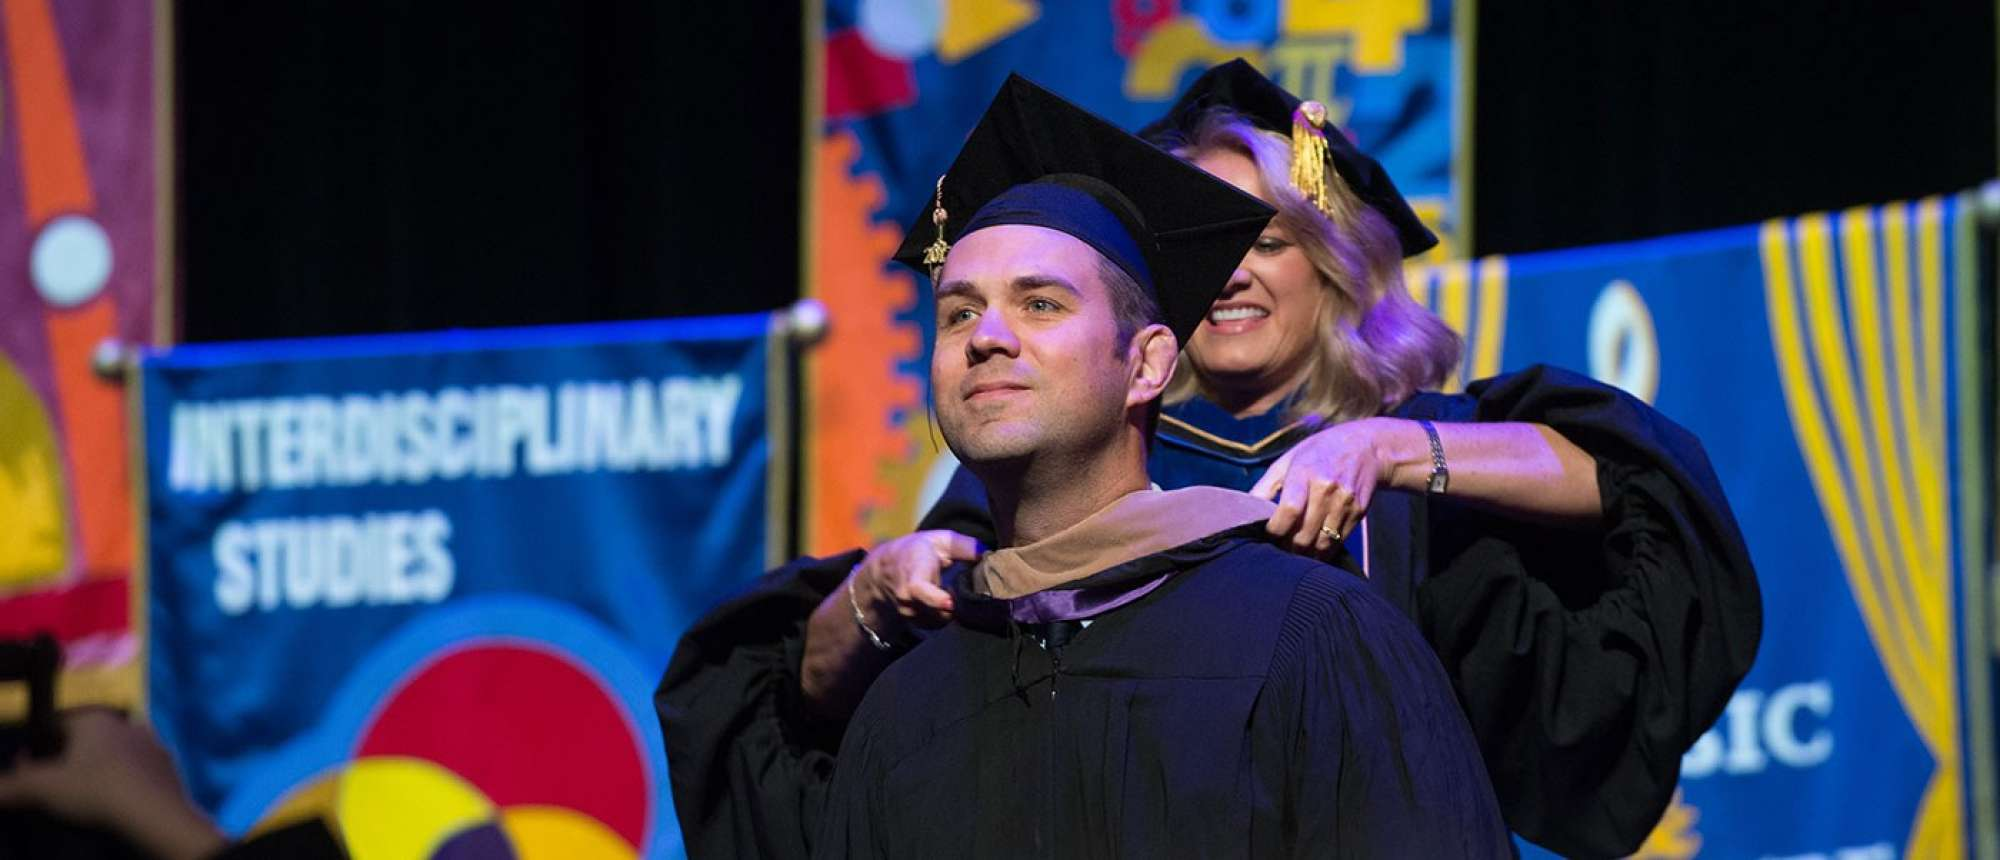 Carl Bliss on graduation